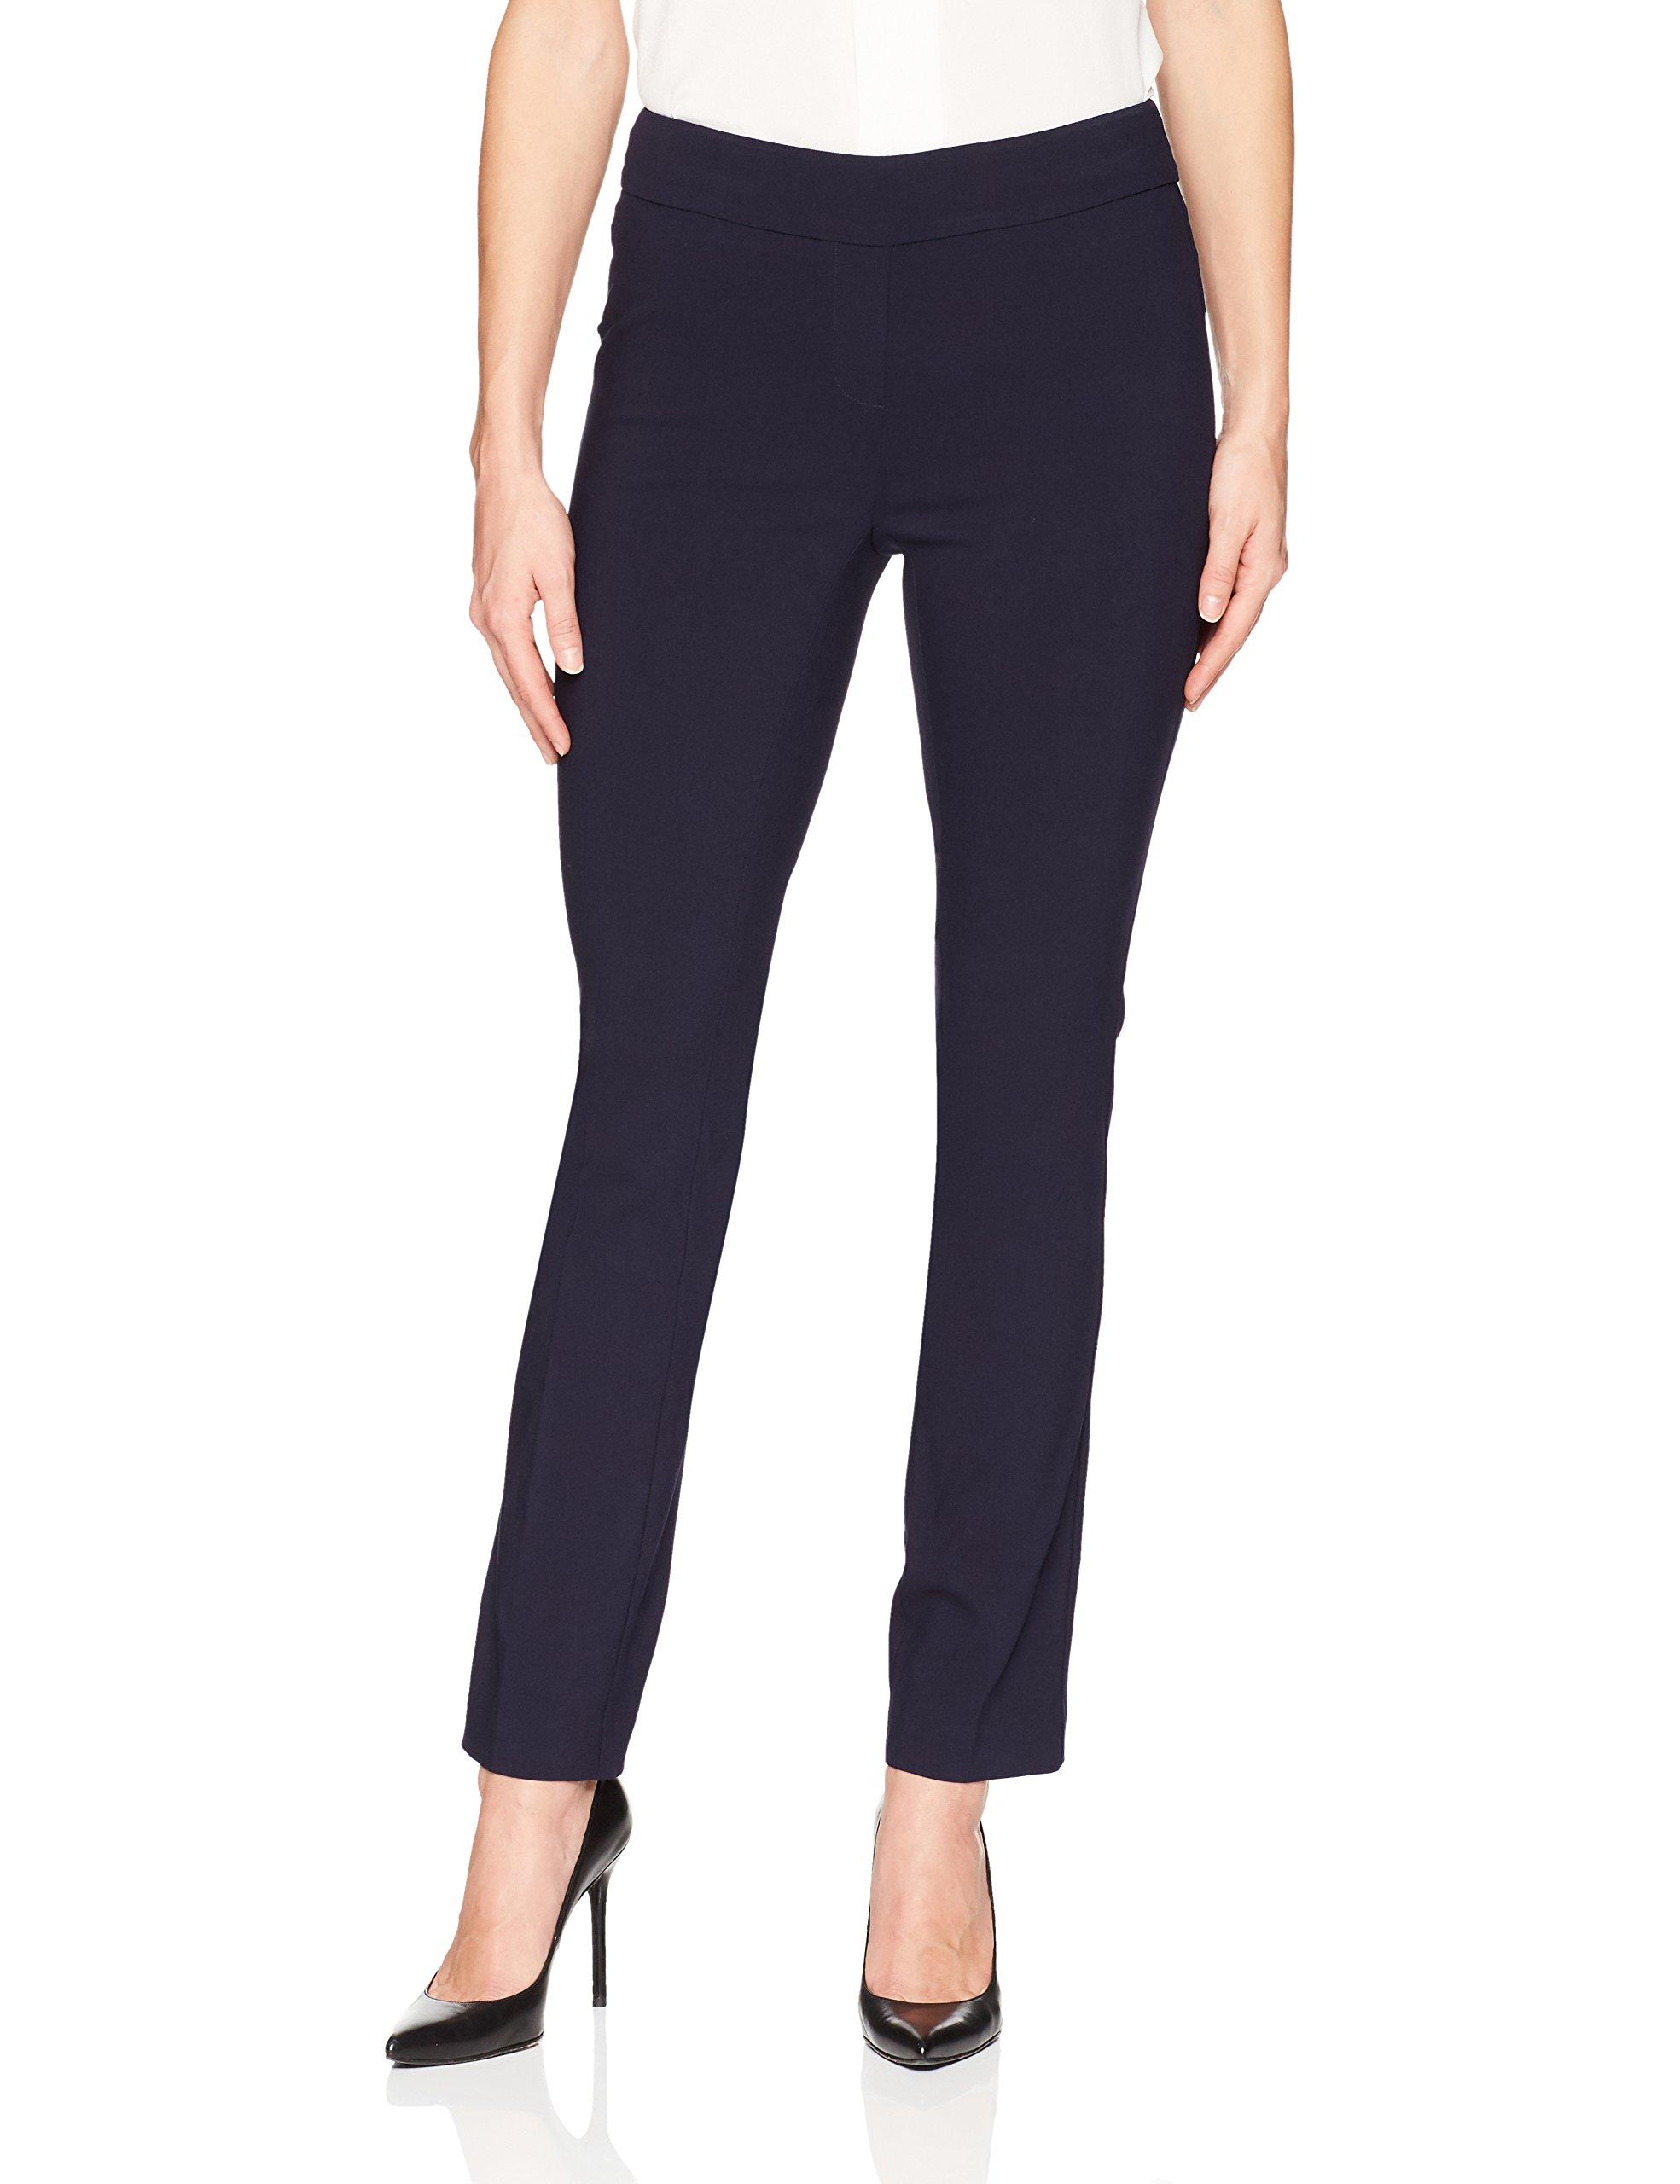 Lark & Ro Women's Slim Leg Stretch Pant: Comfort Fit, Navy, 12